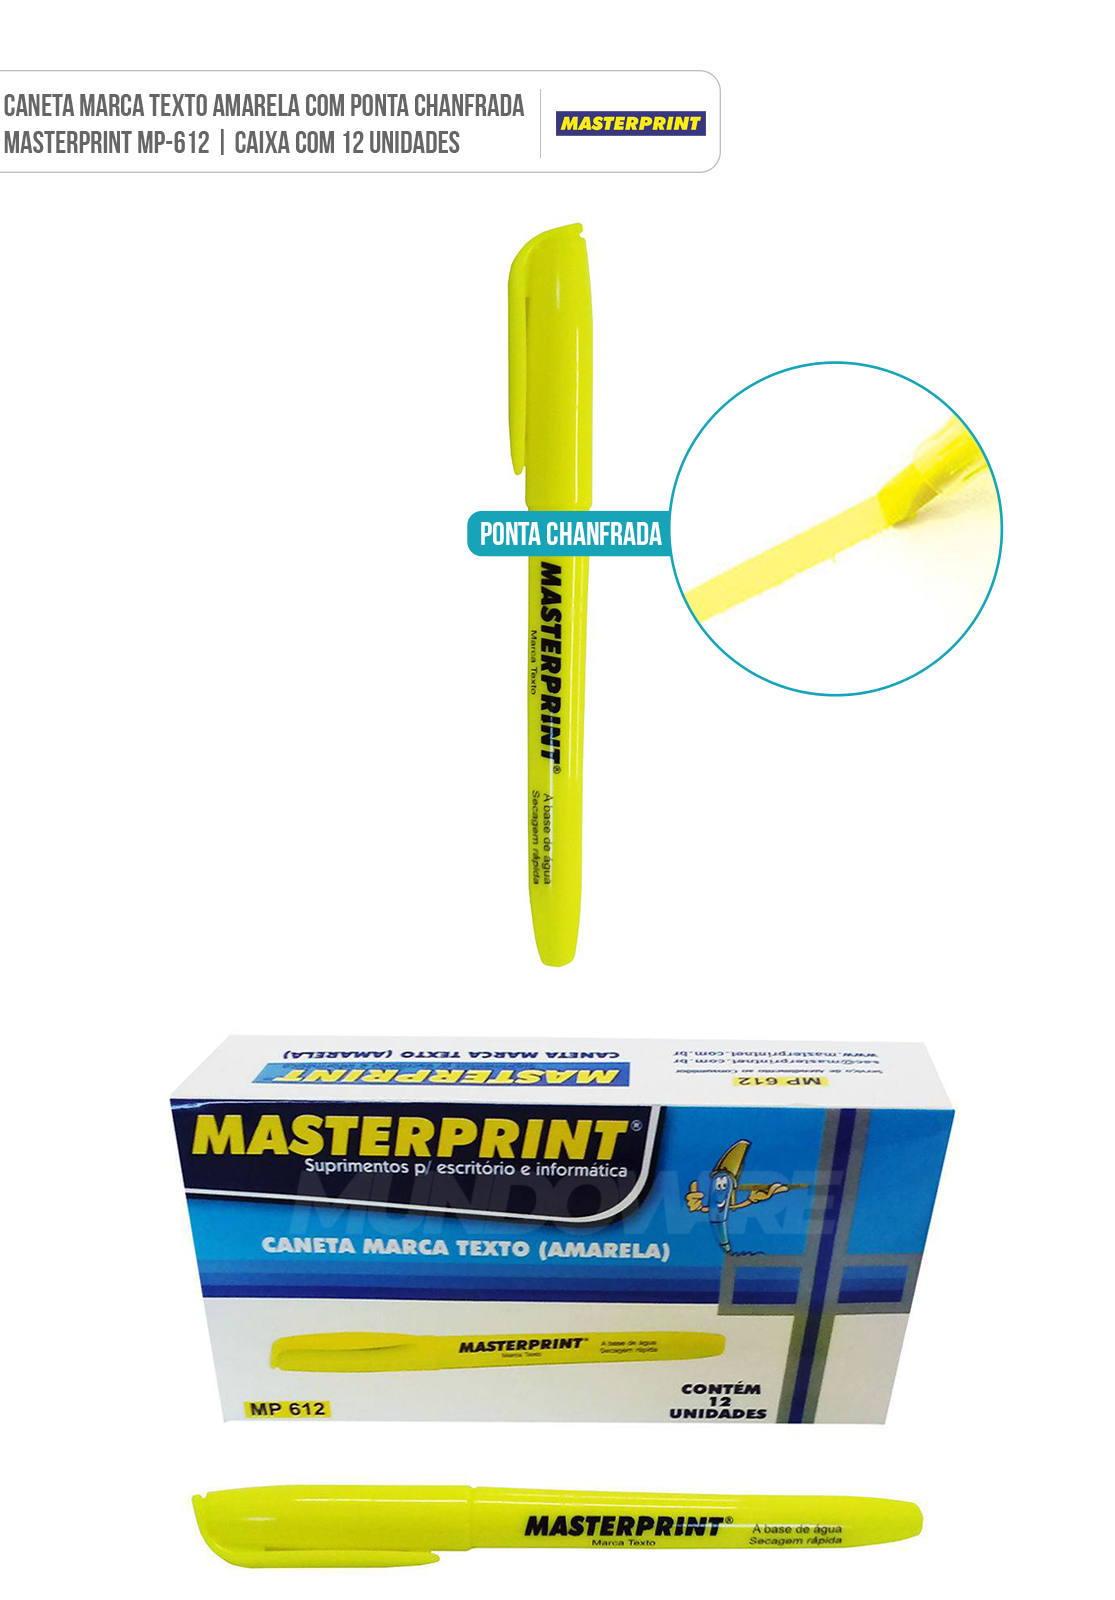 Pincel Marca Texto Caneta Amarela para marcar texto com ponta chanfrada